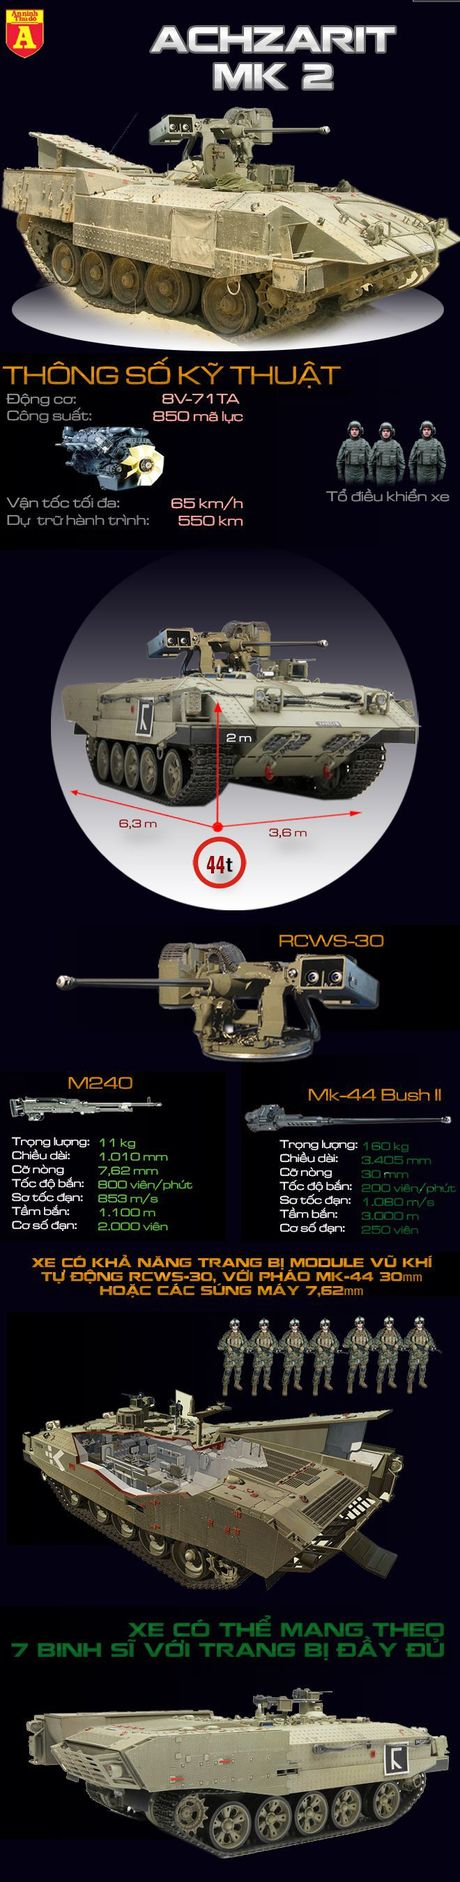 Giai phap khien tang T-54 Viet Nam 'cai lao hoan dong' - Anh 2